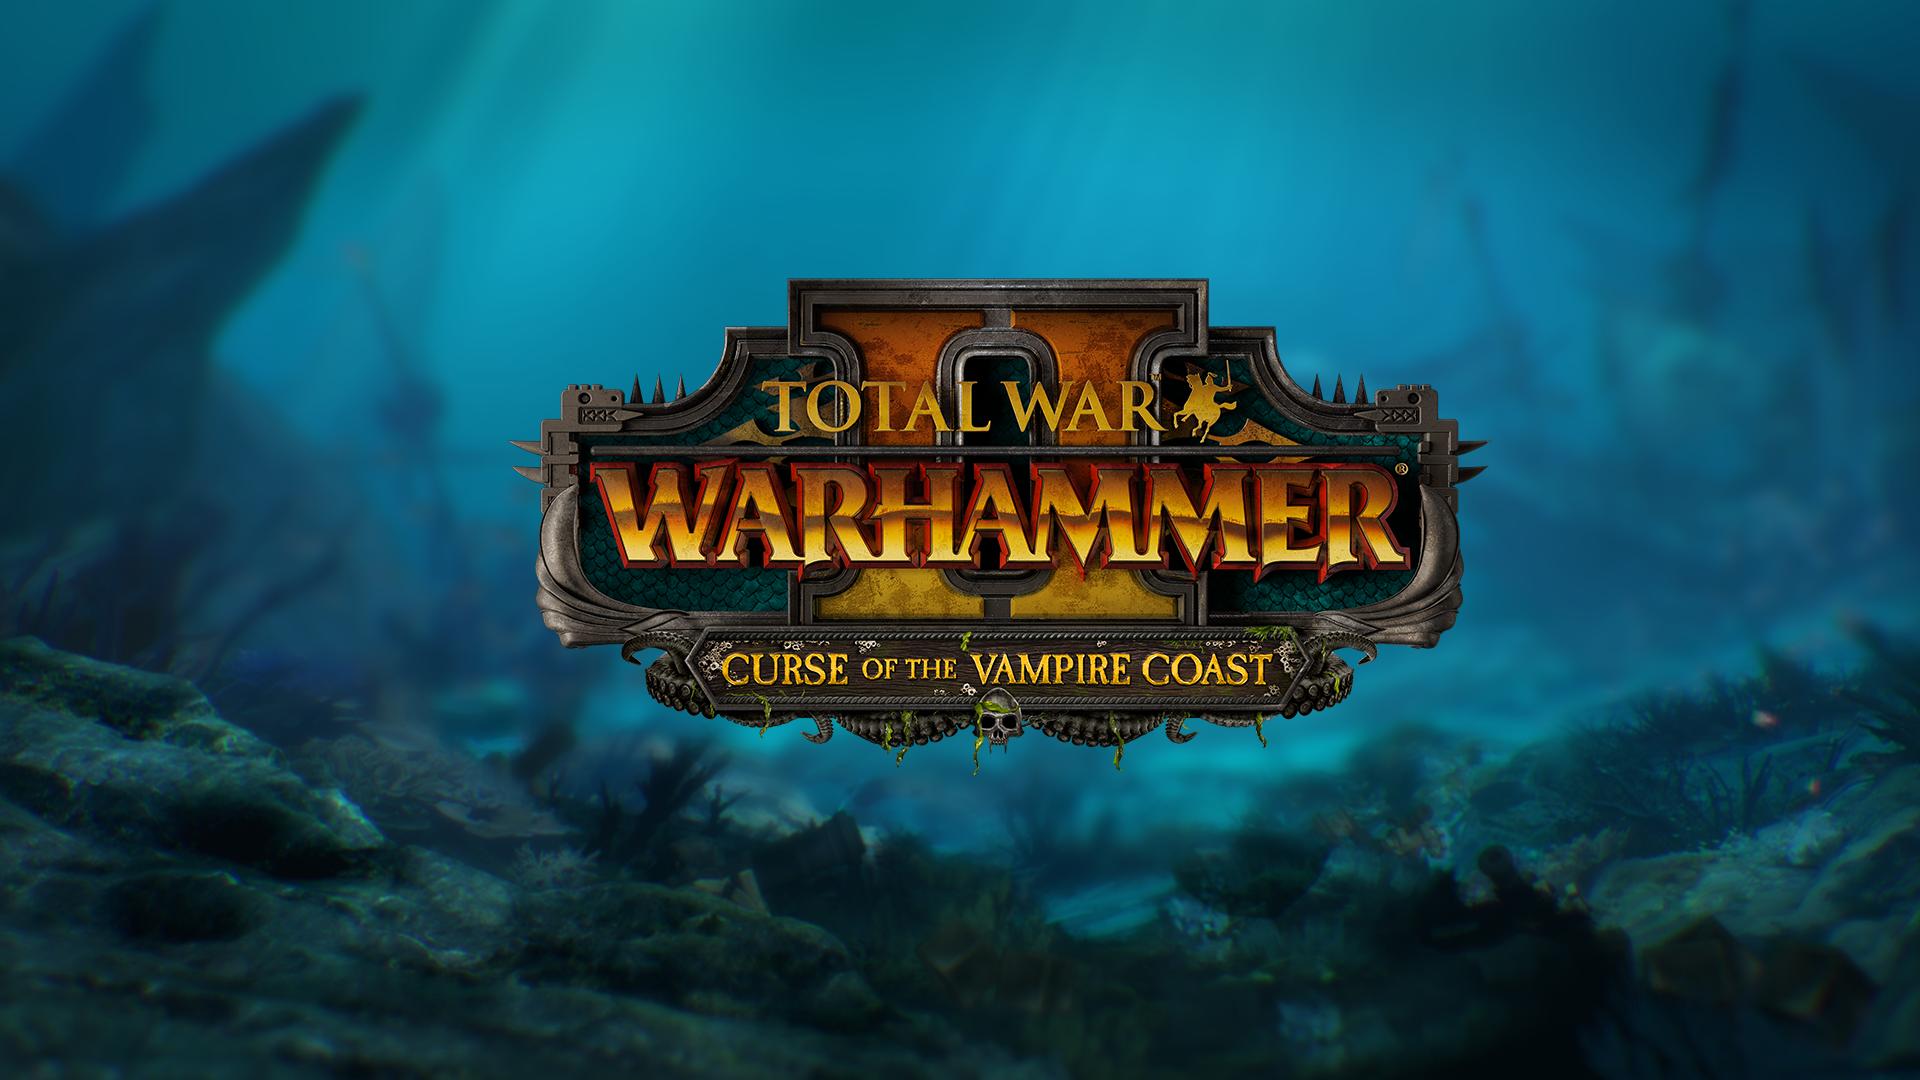 kép:https://content.totalwar.com/total-war/com.totalwar.www/wp-content/uploads/2018/10/04143458/COTVC_waterBG_logosmall.png